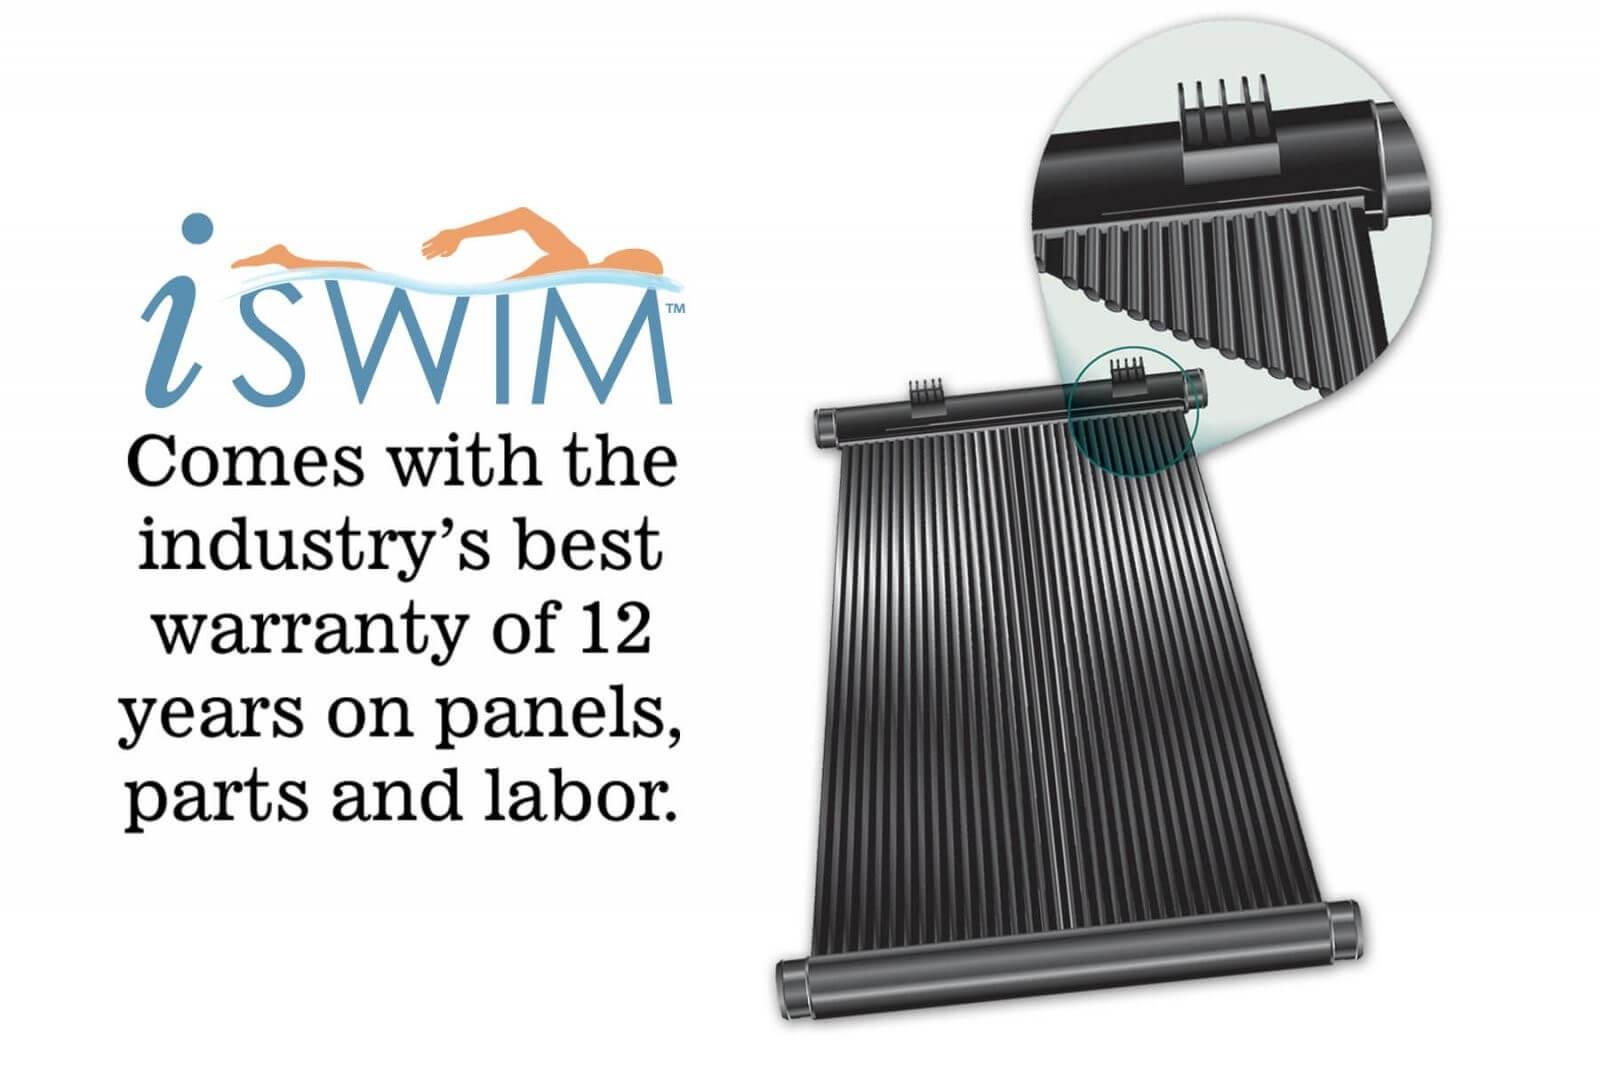 iSwim solar panels